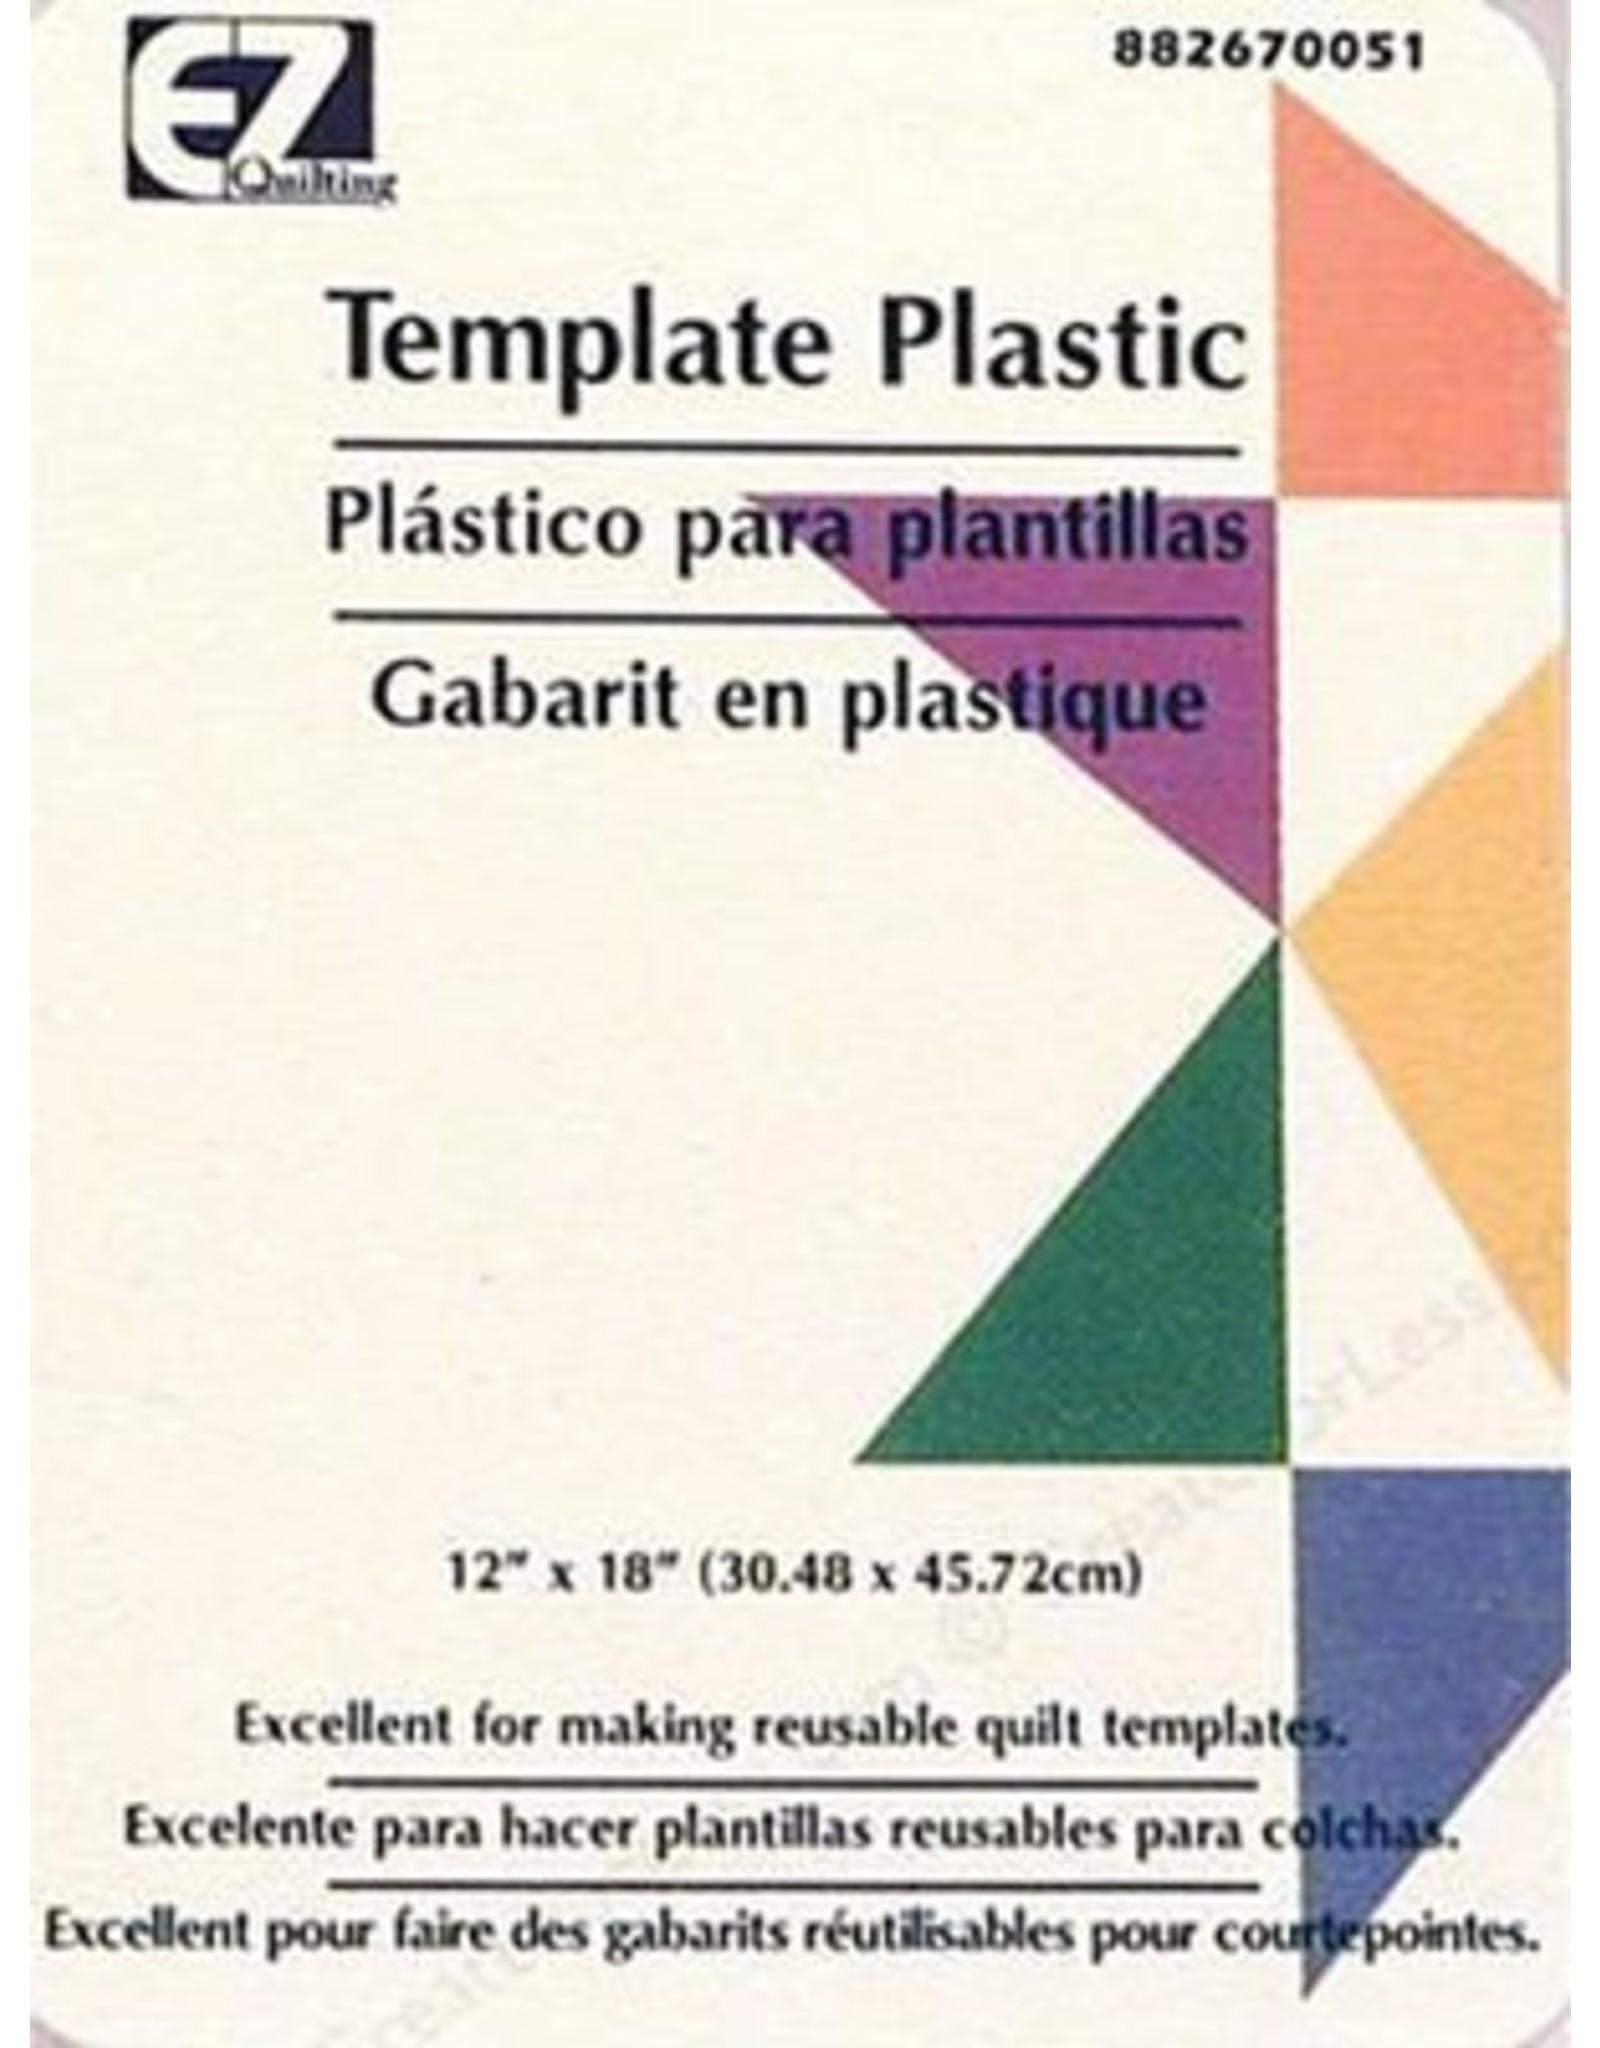 Diversen EZ Quilting template plastic - 12 x 18 inch